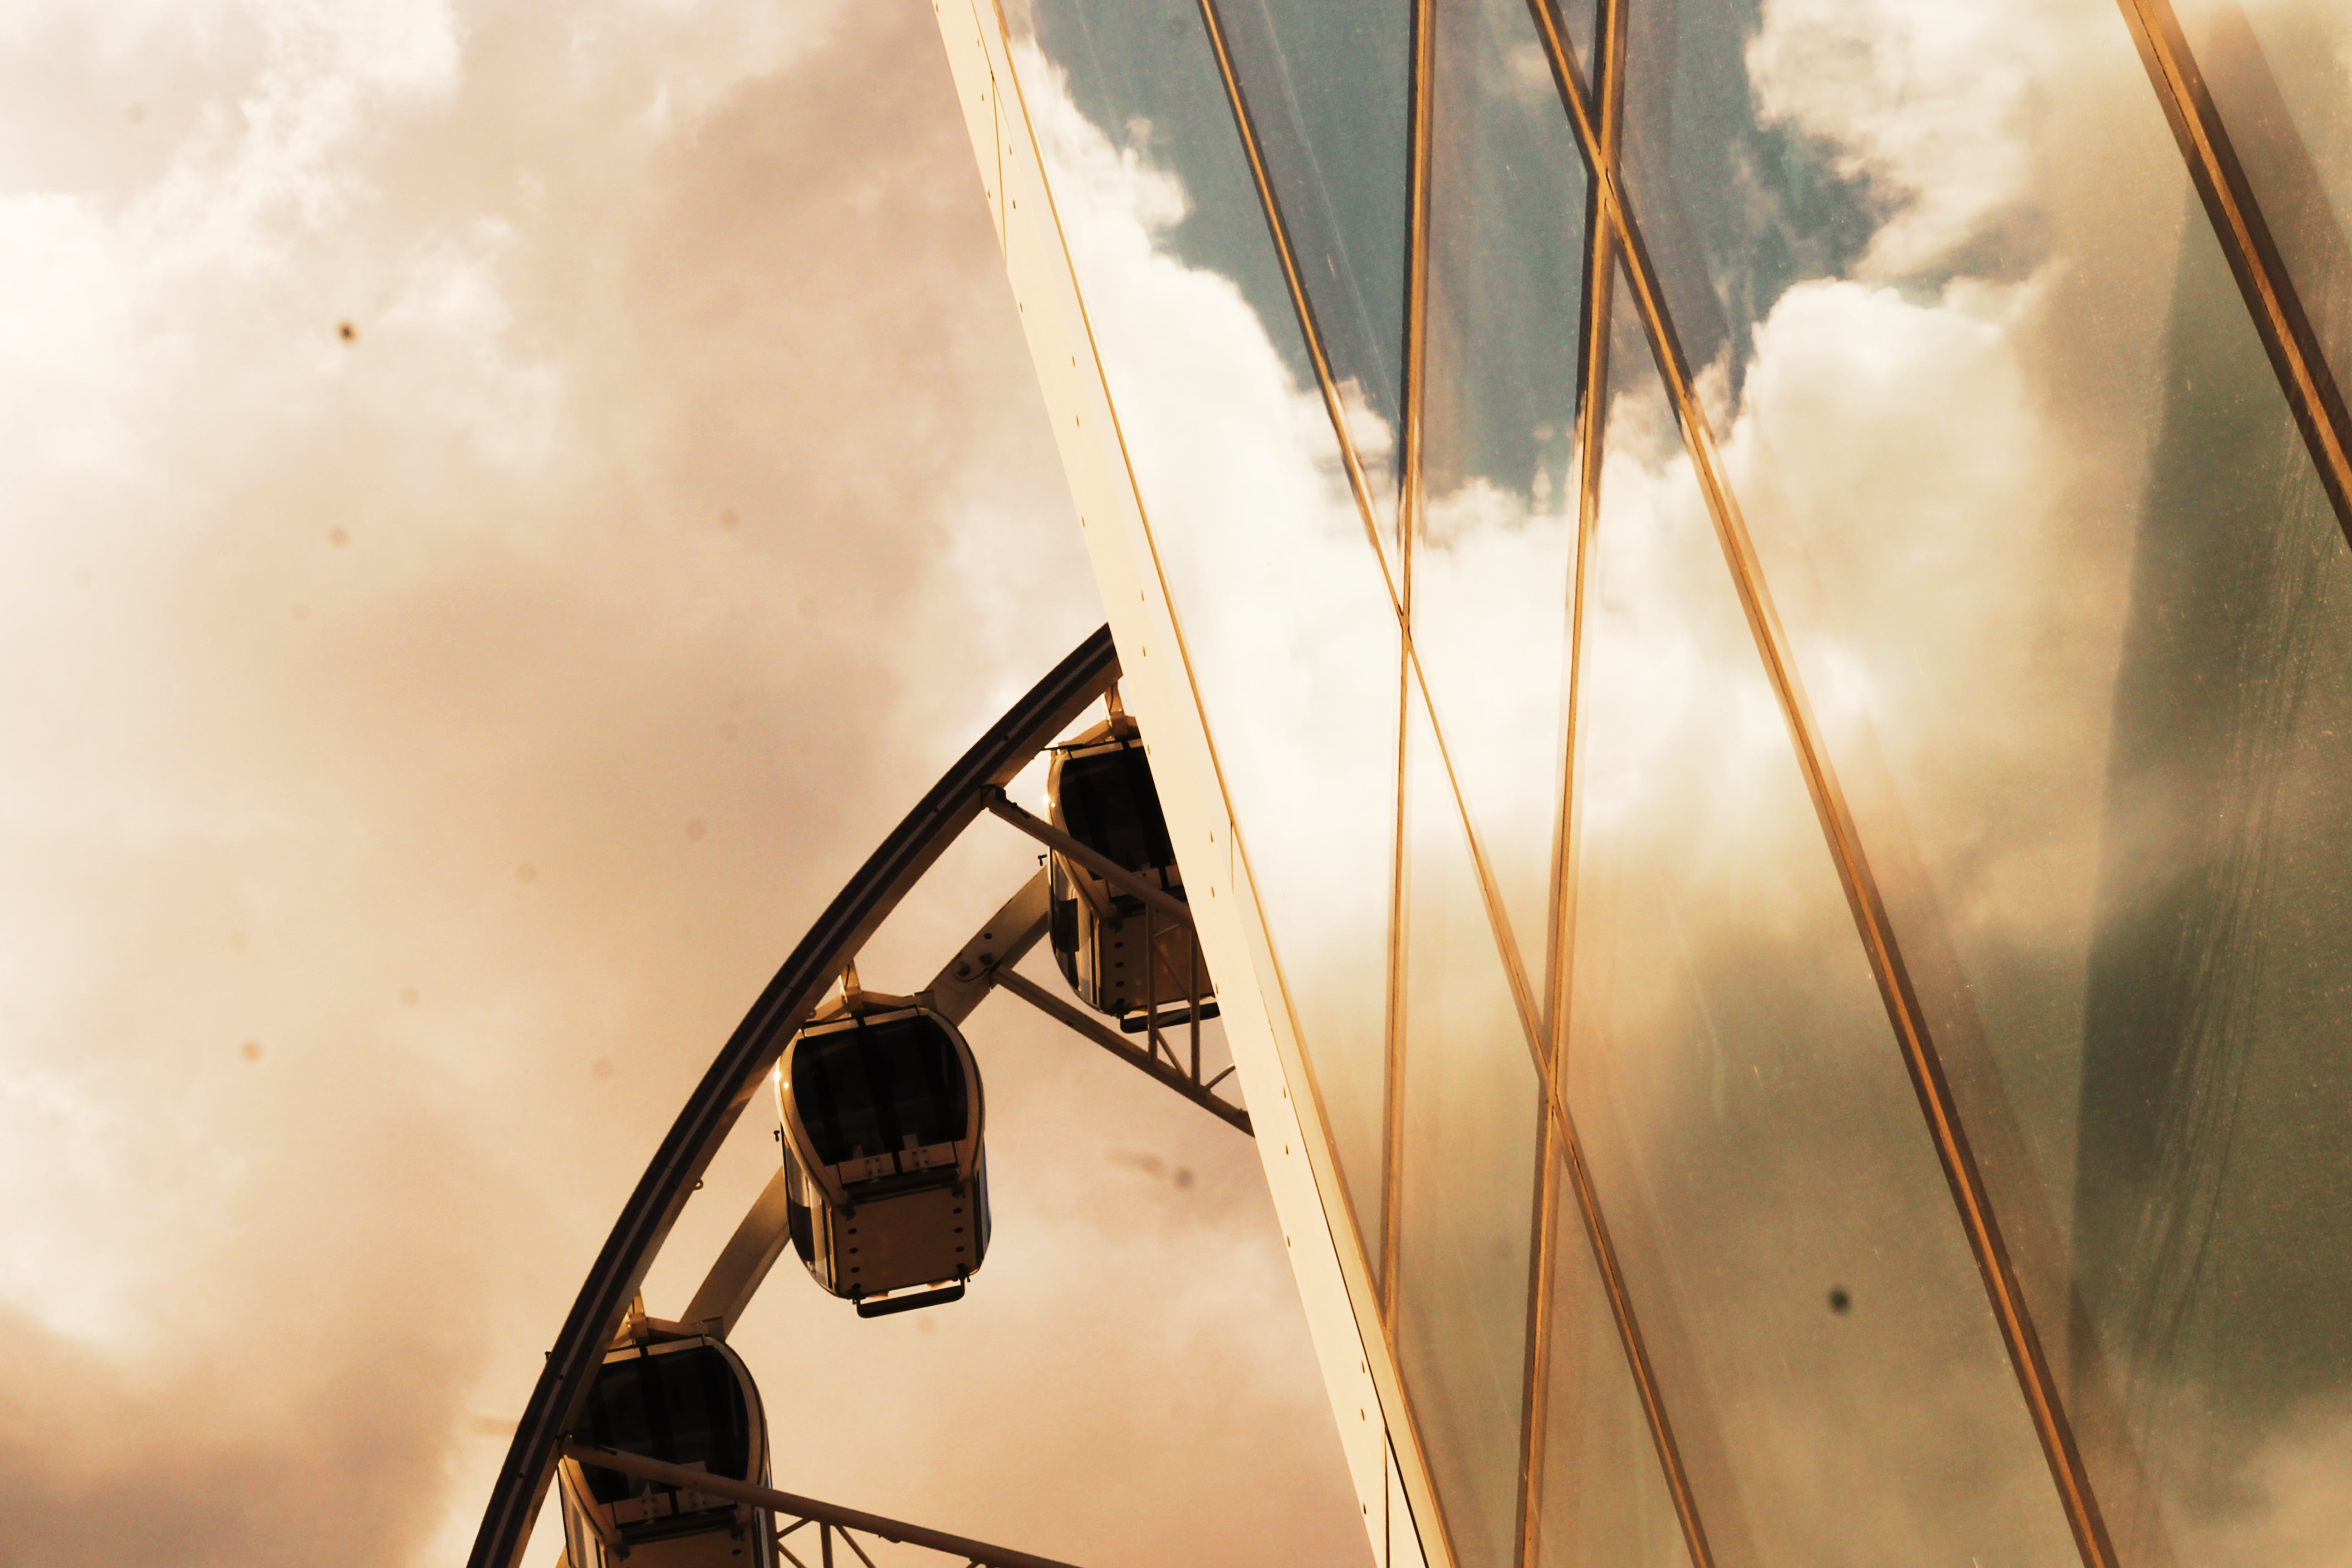 architecture, ferris wheel, reflection